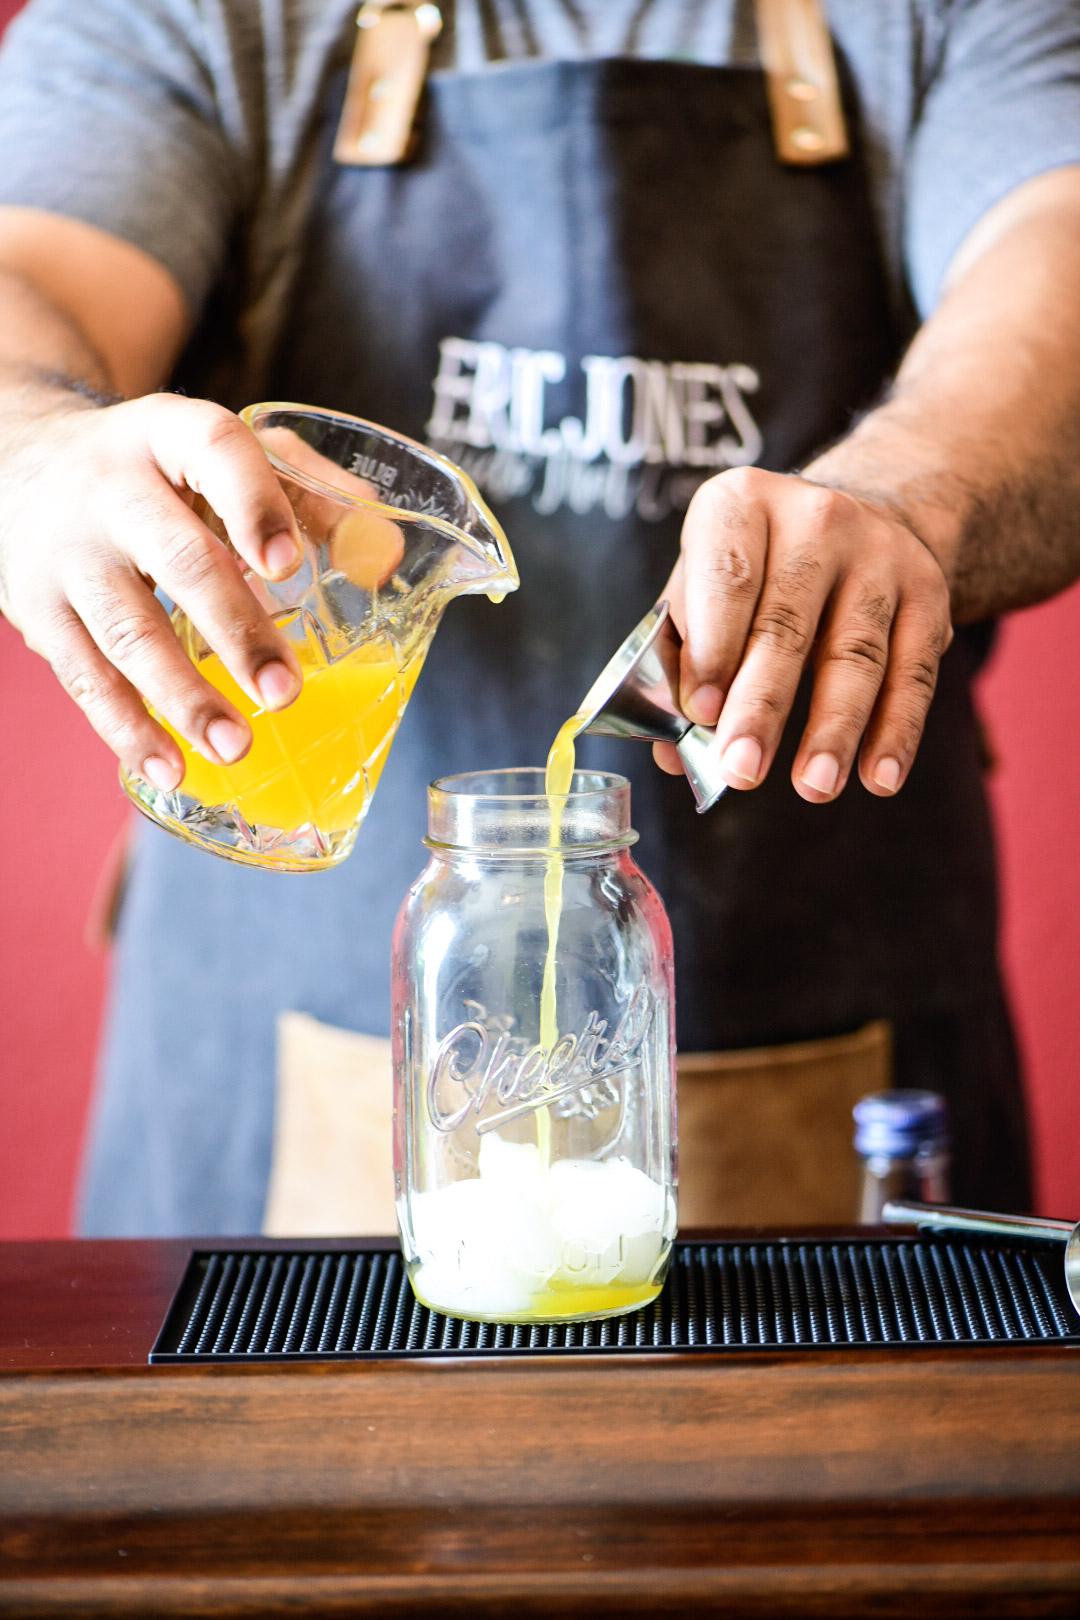 Adding fresh mandarin juice to cocktail shaker for Mandarin Orange Crush Cocktail